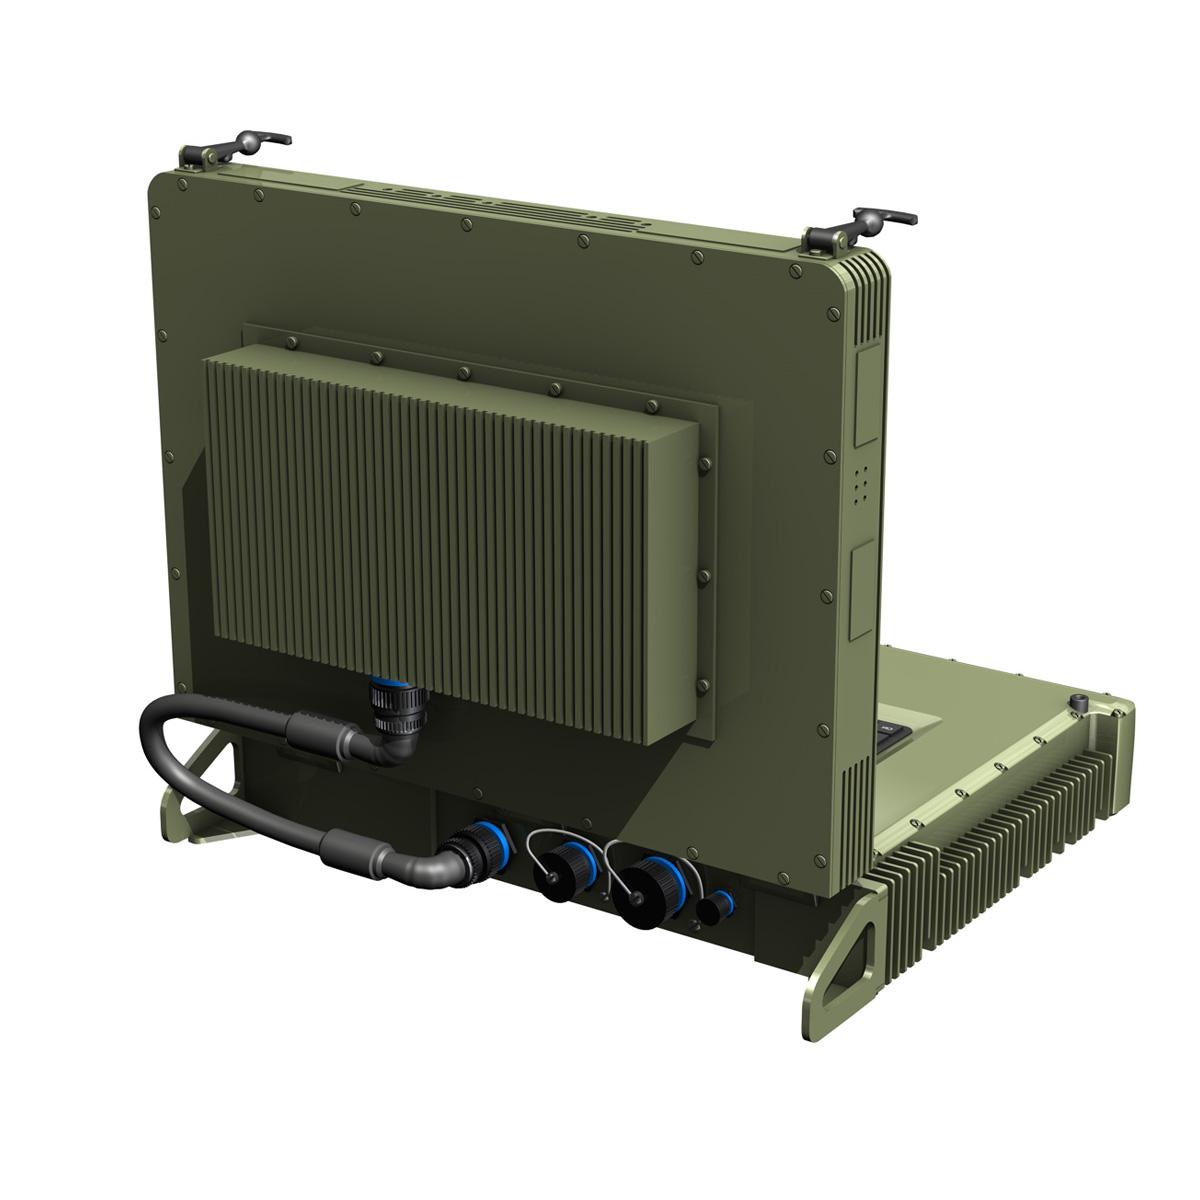 rugged military outdoor laptop 3d model 3ds fbx c4d lwo obj 189355